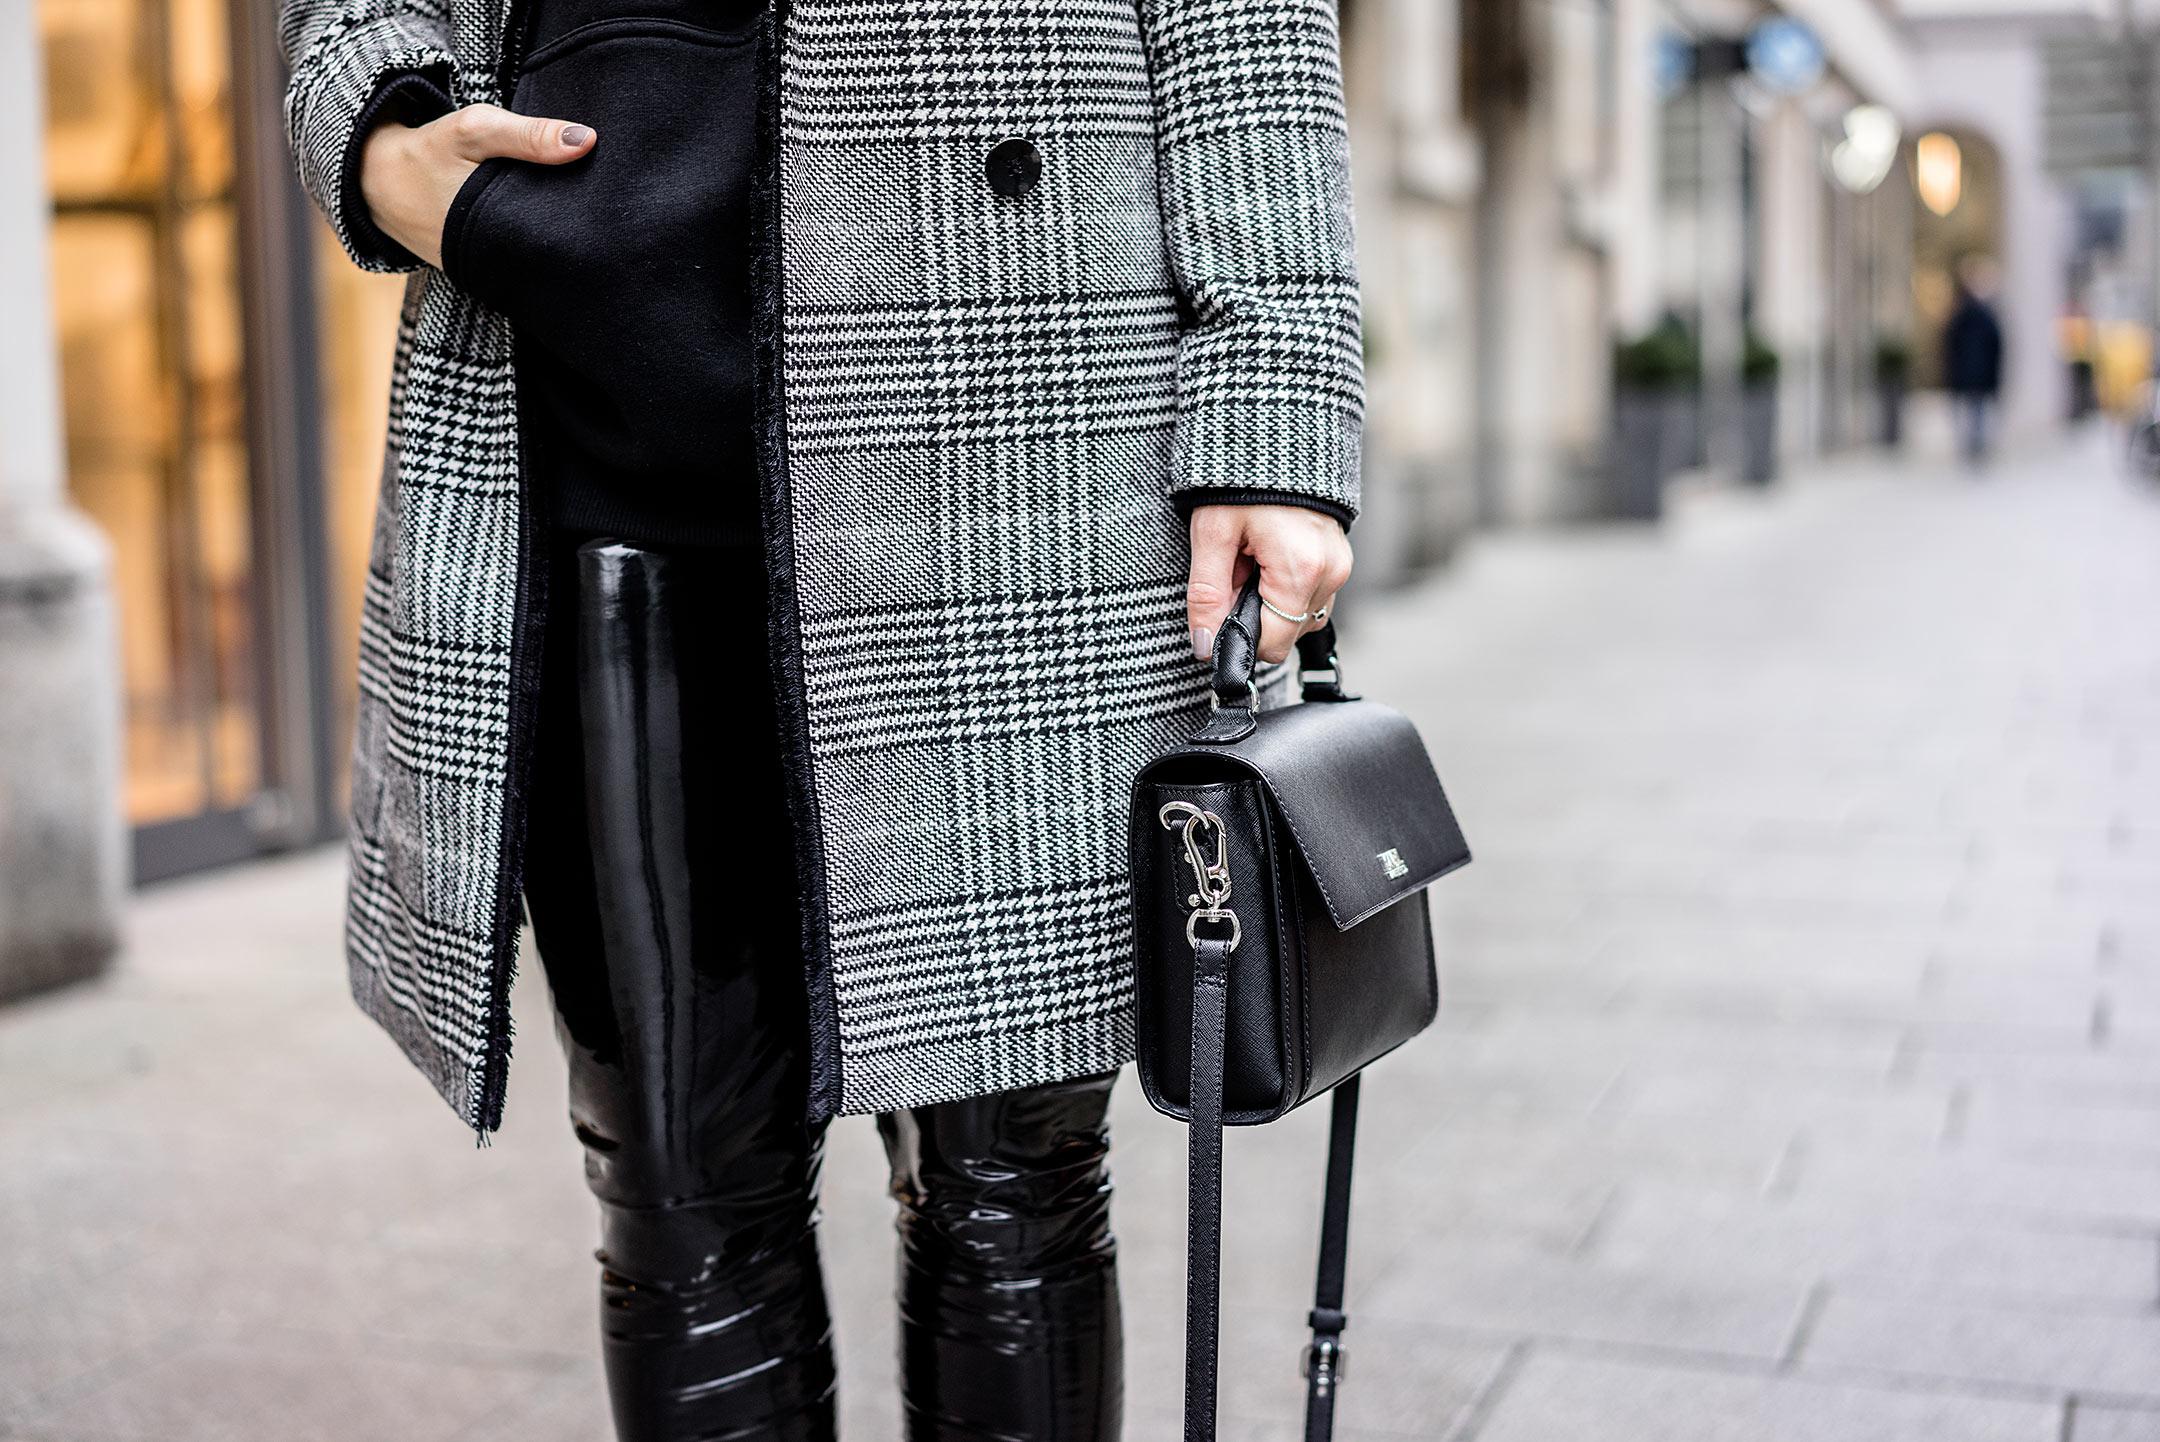 Karo Muster Herbst ootd Modeblog Sunnyinga Düsseldorf